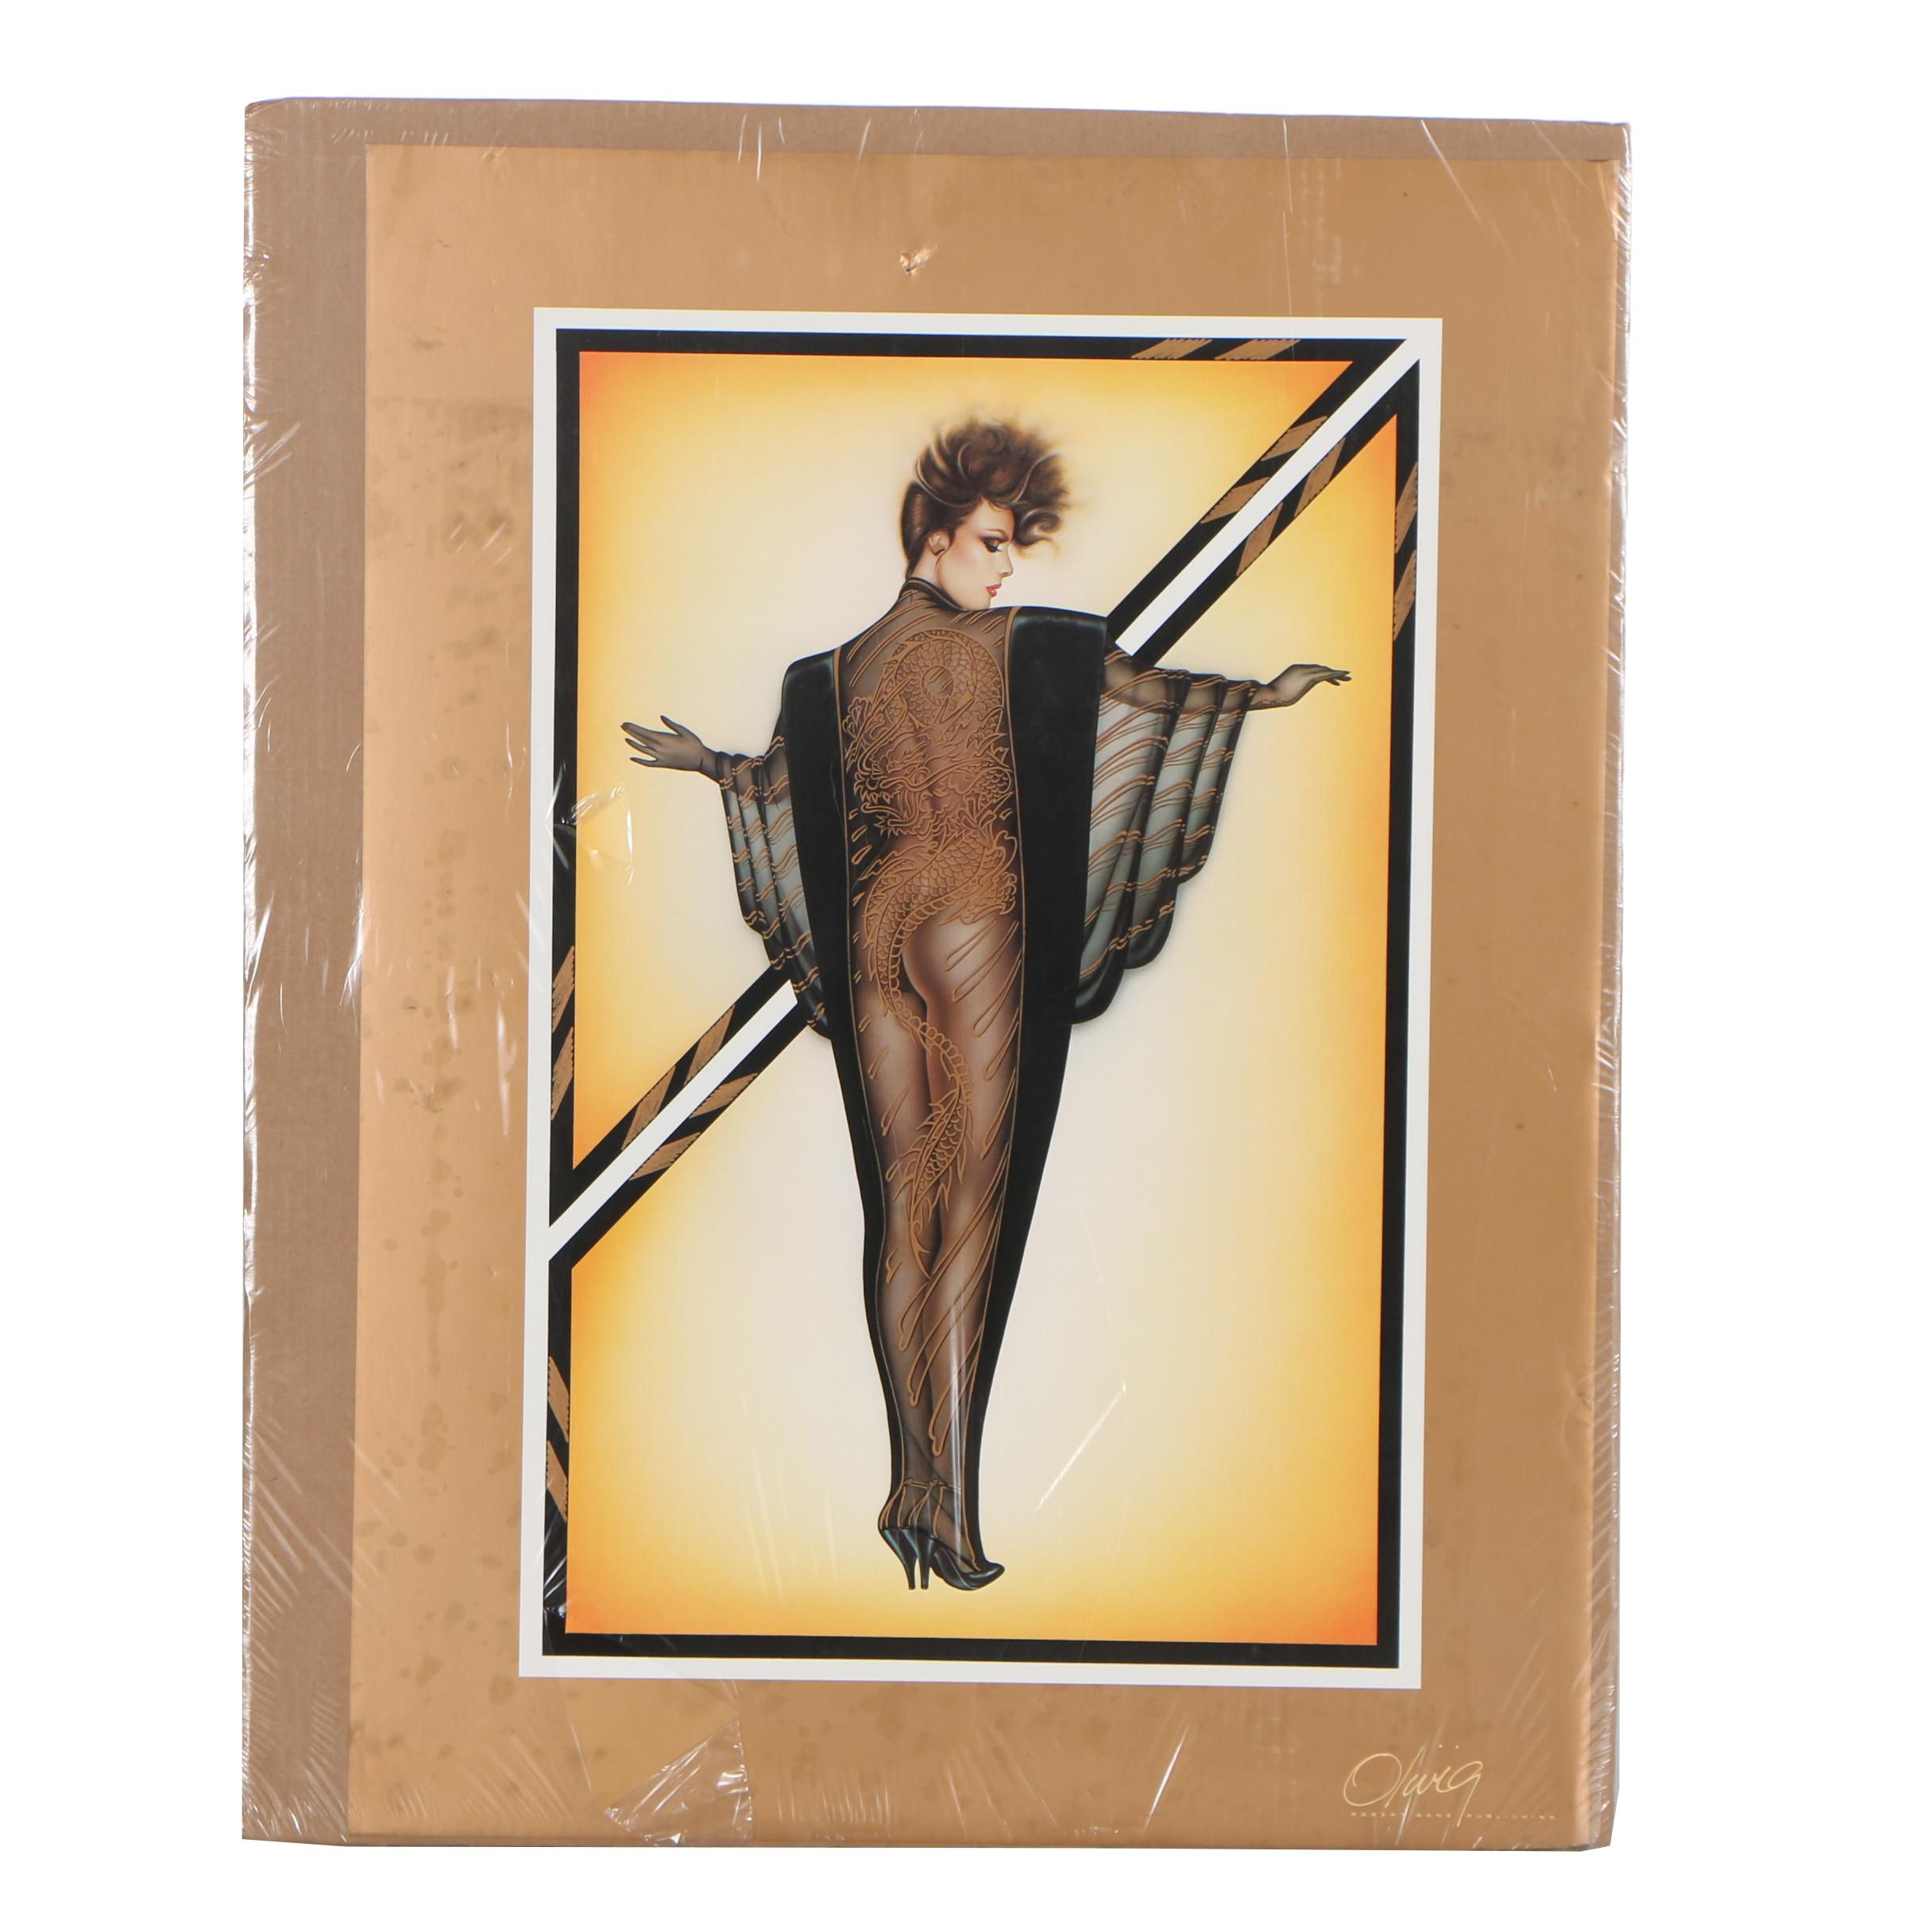 Offset Lithograph after Olivia De Berardinis